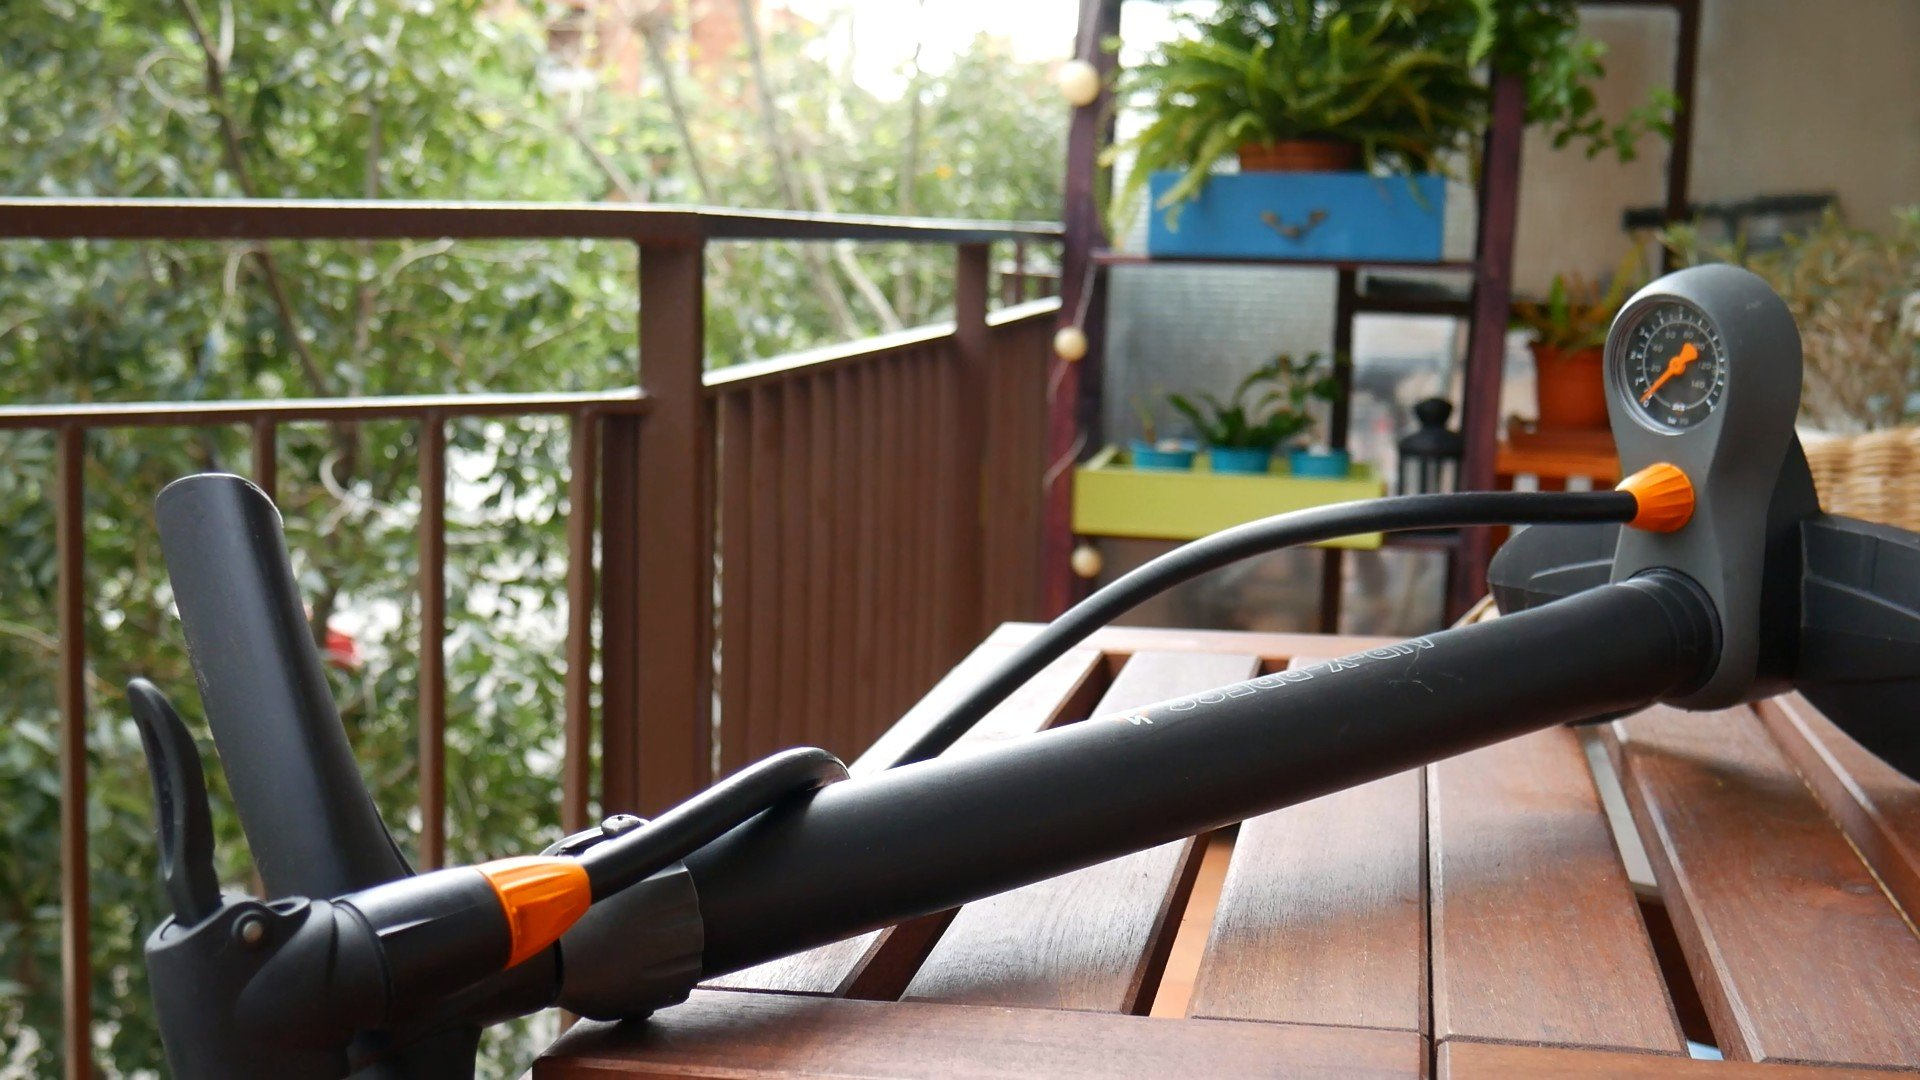 bomba taller sks review